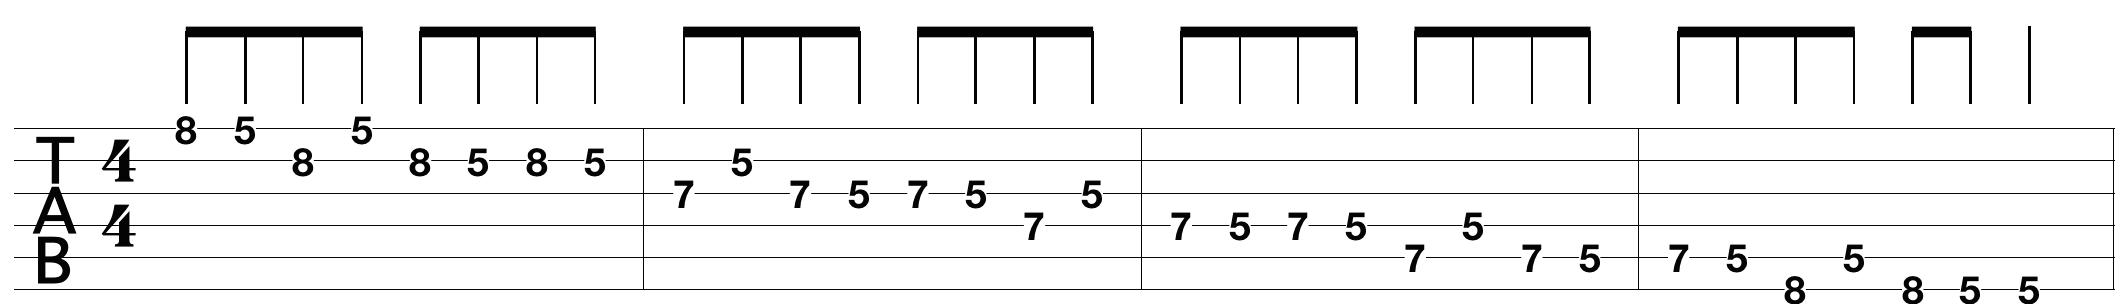 super-easy-guitar-tabs_2.png